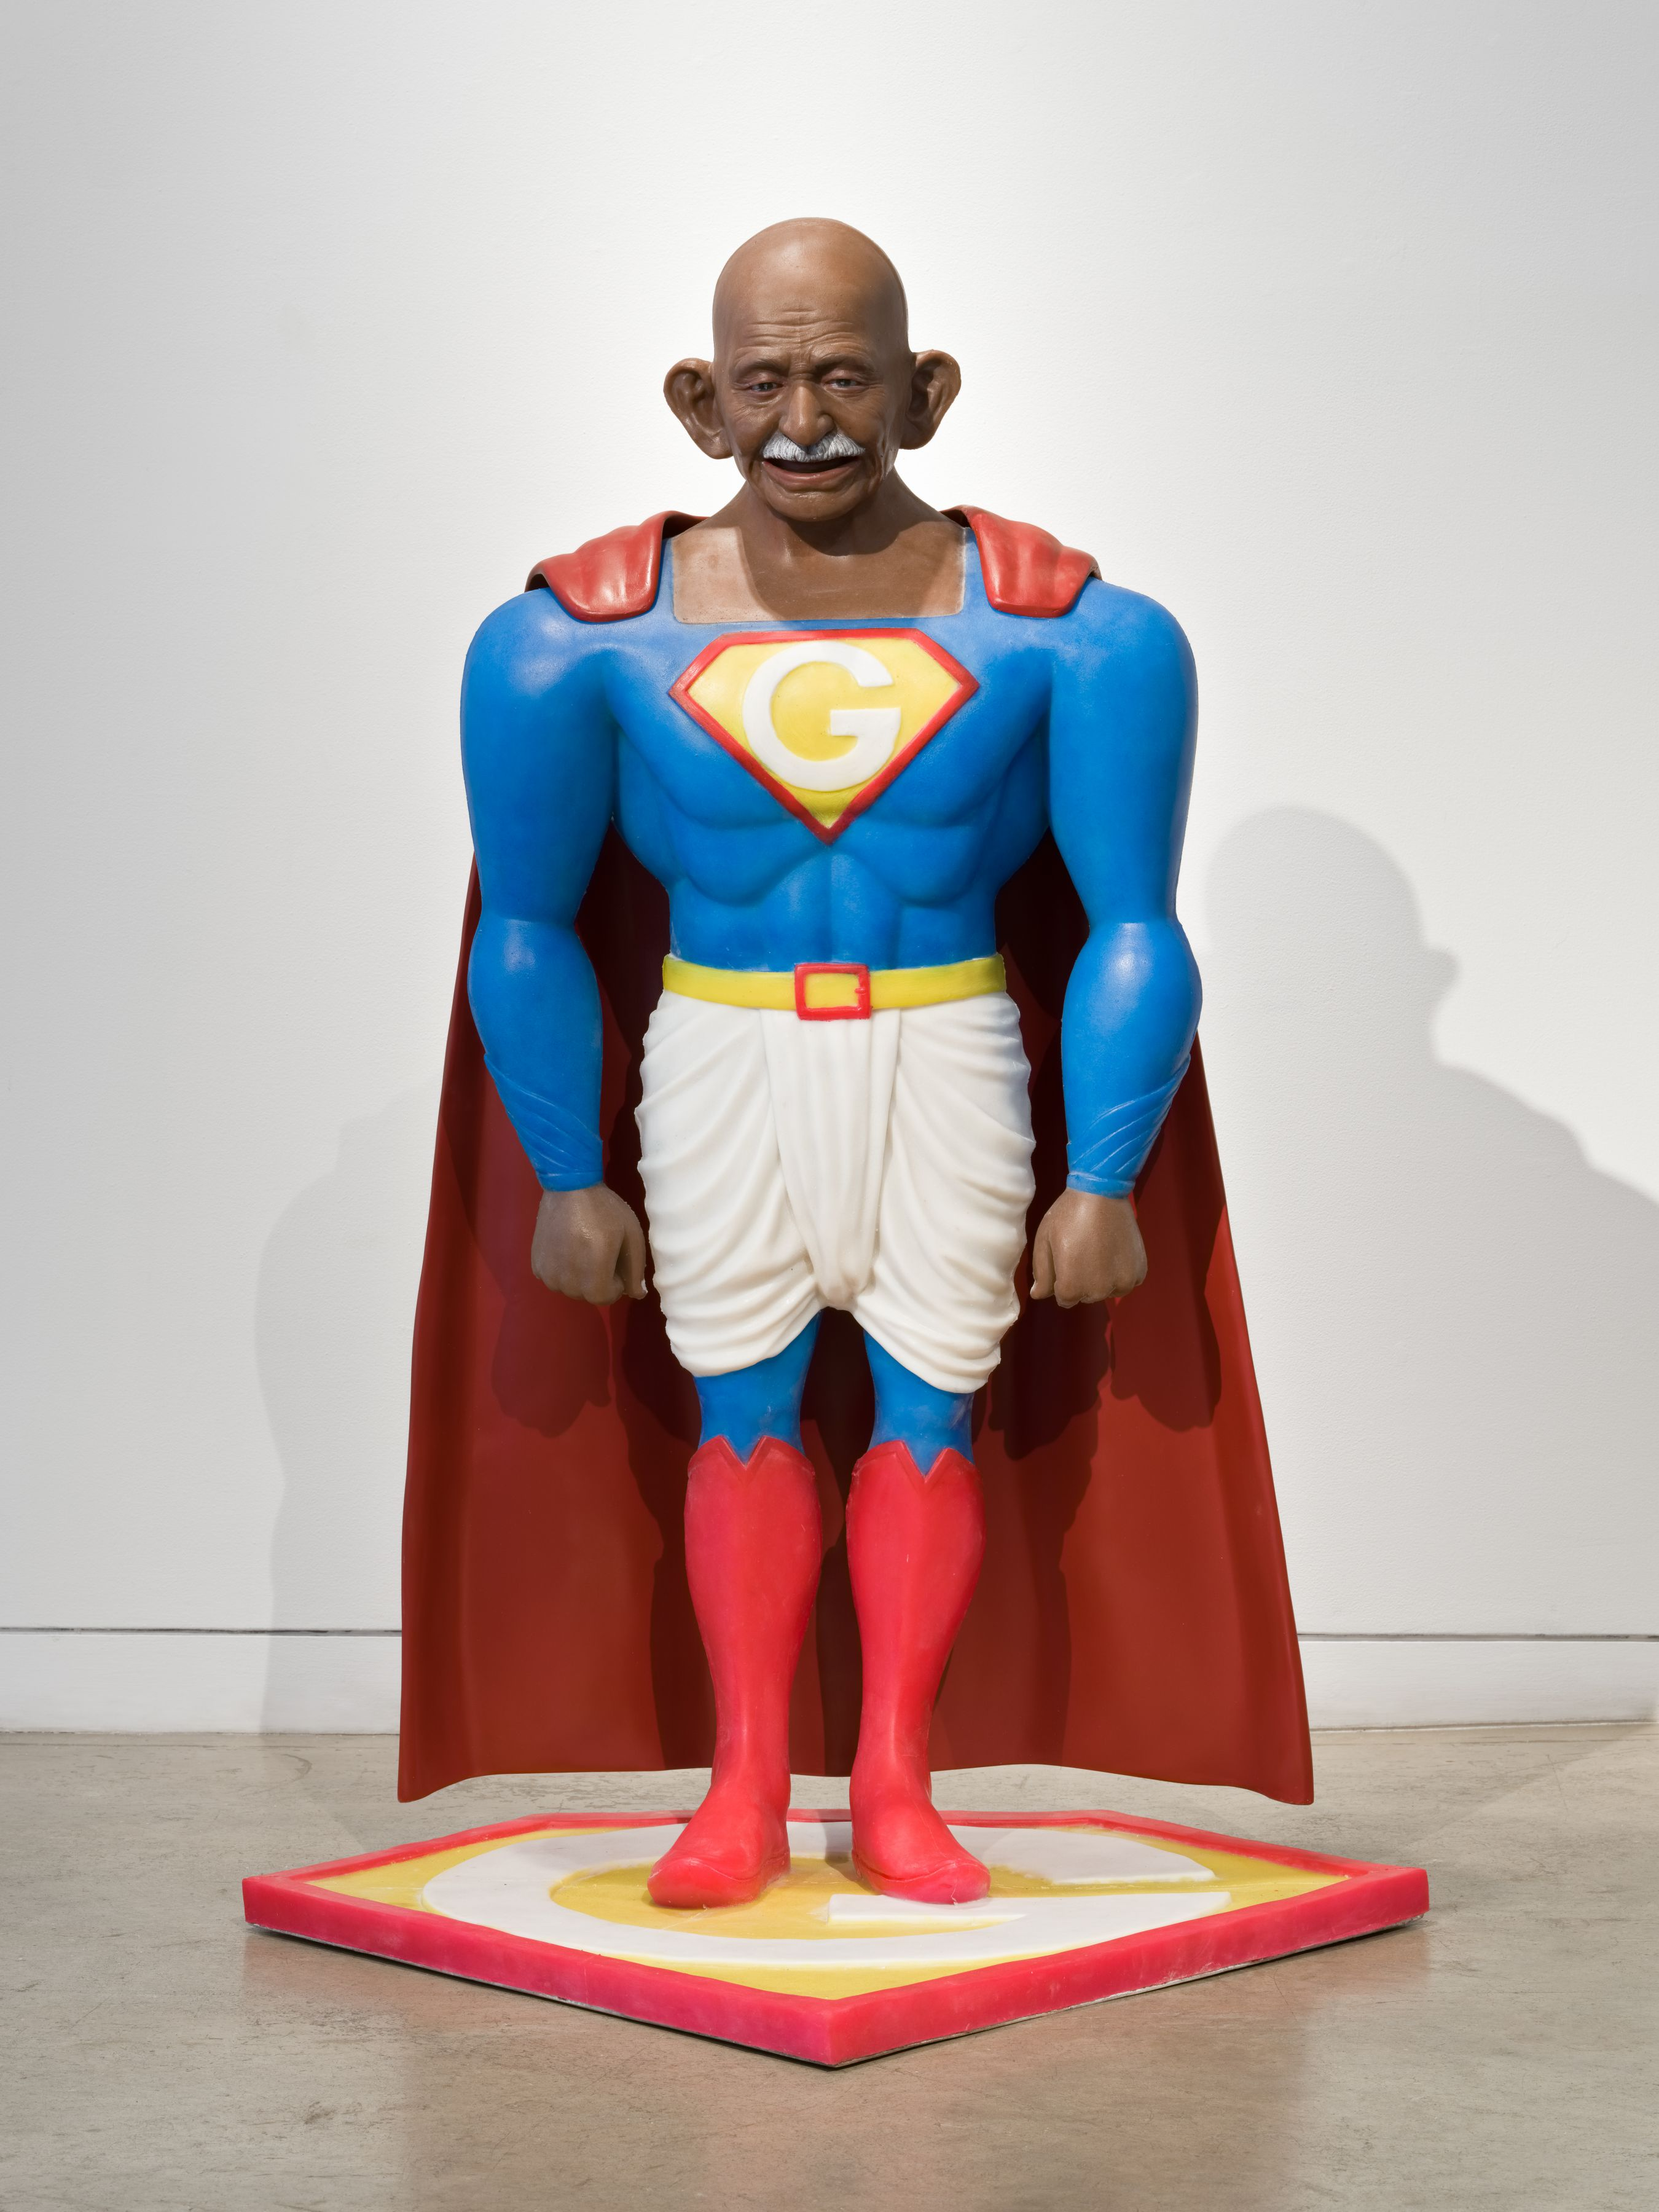 Toy Gandhi 4 (Superhero)